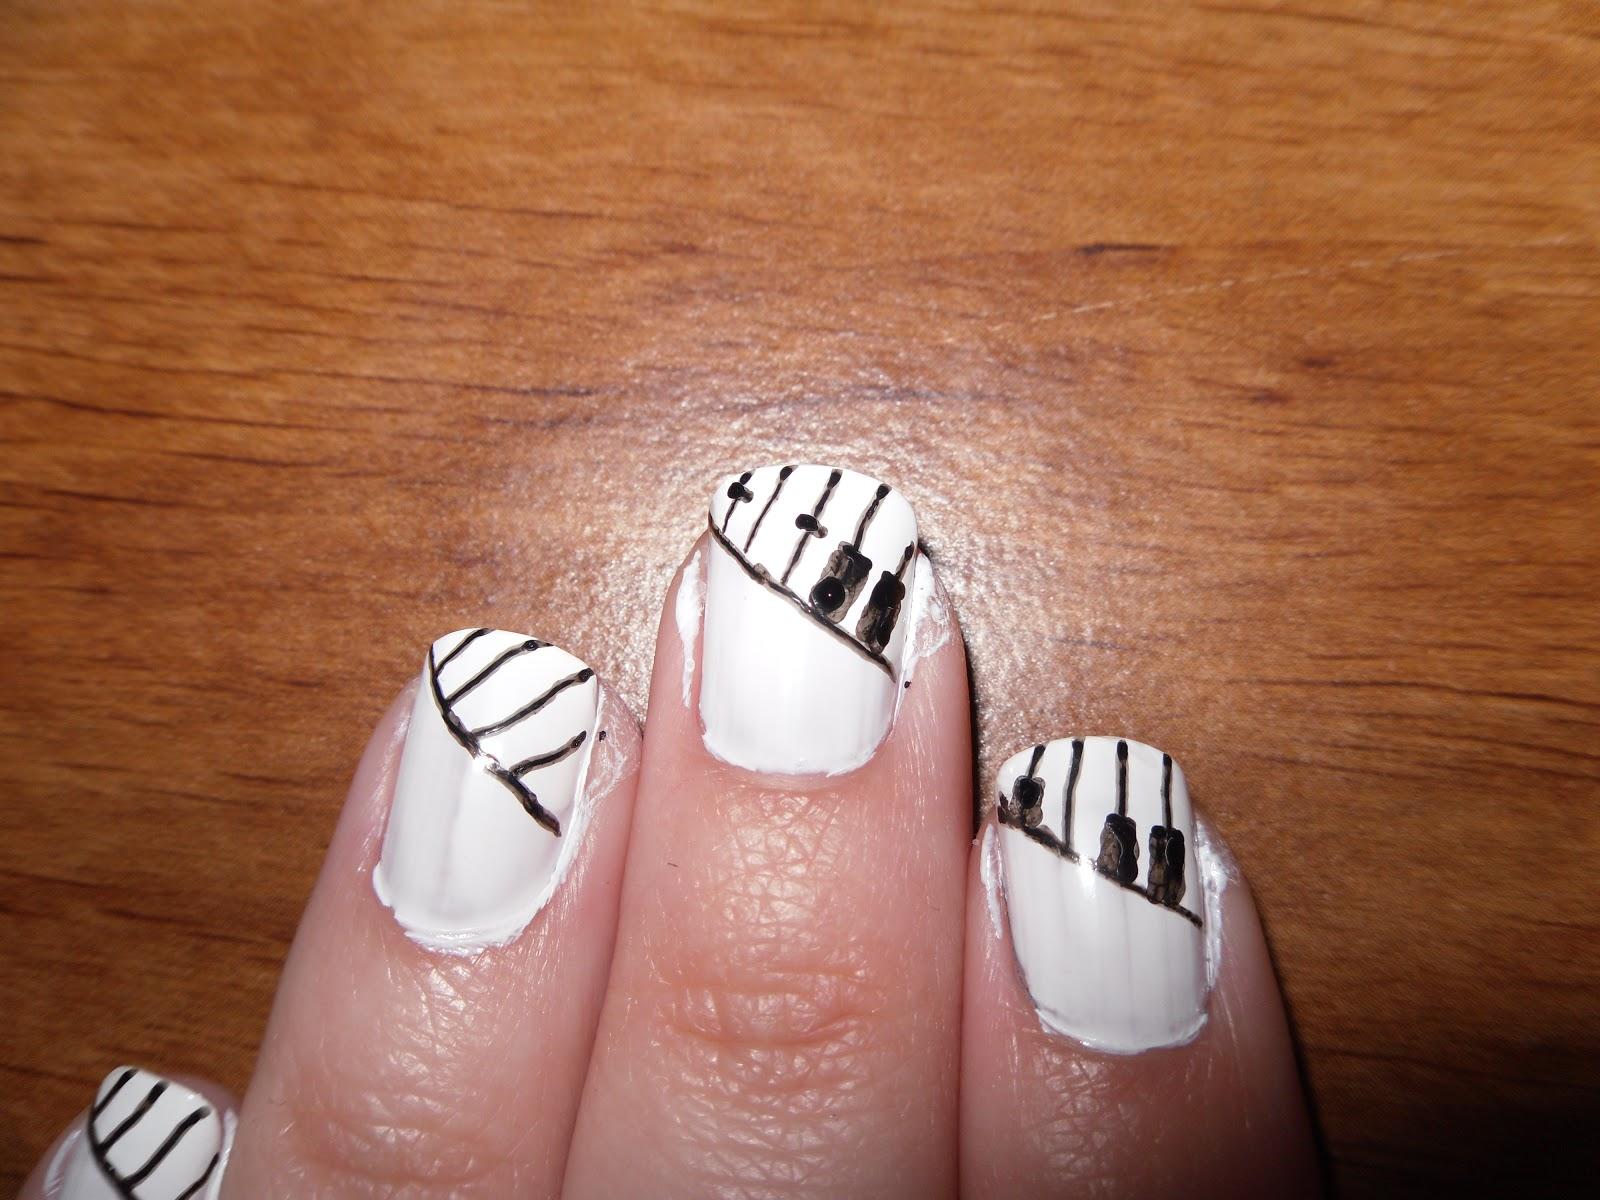 Nail Polish On Piano Keys Hession Hairdressing